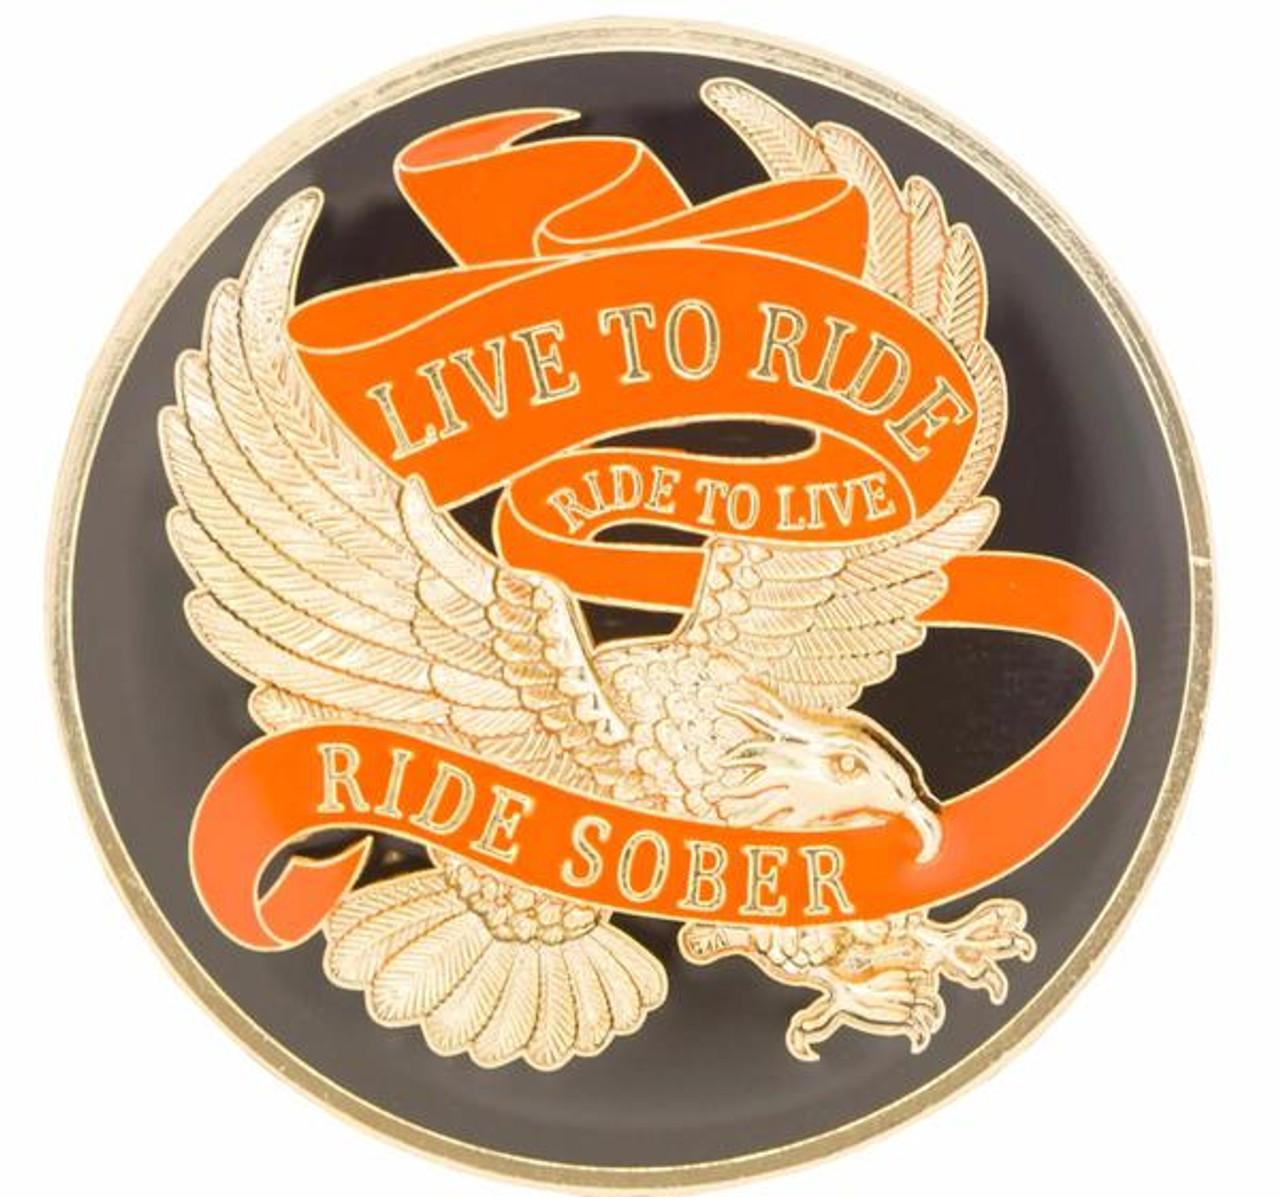 LIVE FREE RIDE SOBER SOBRIETY STICKER